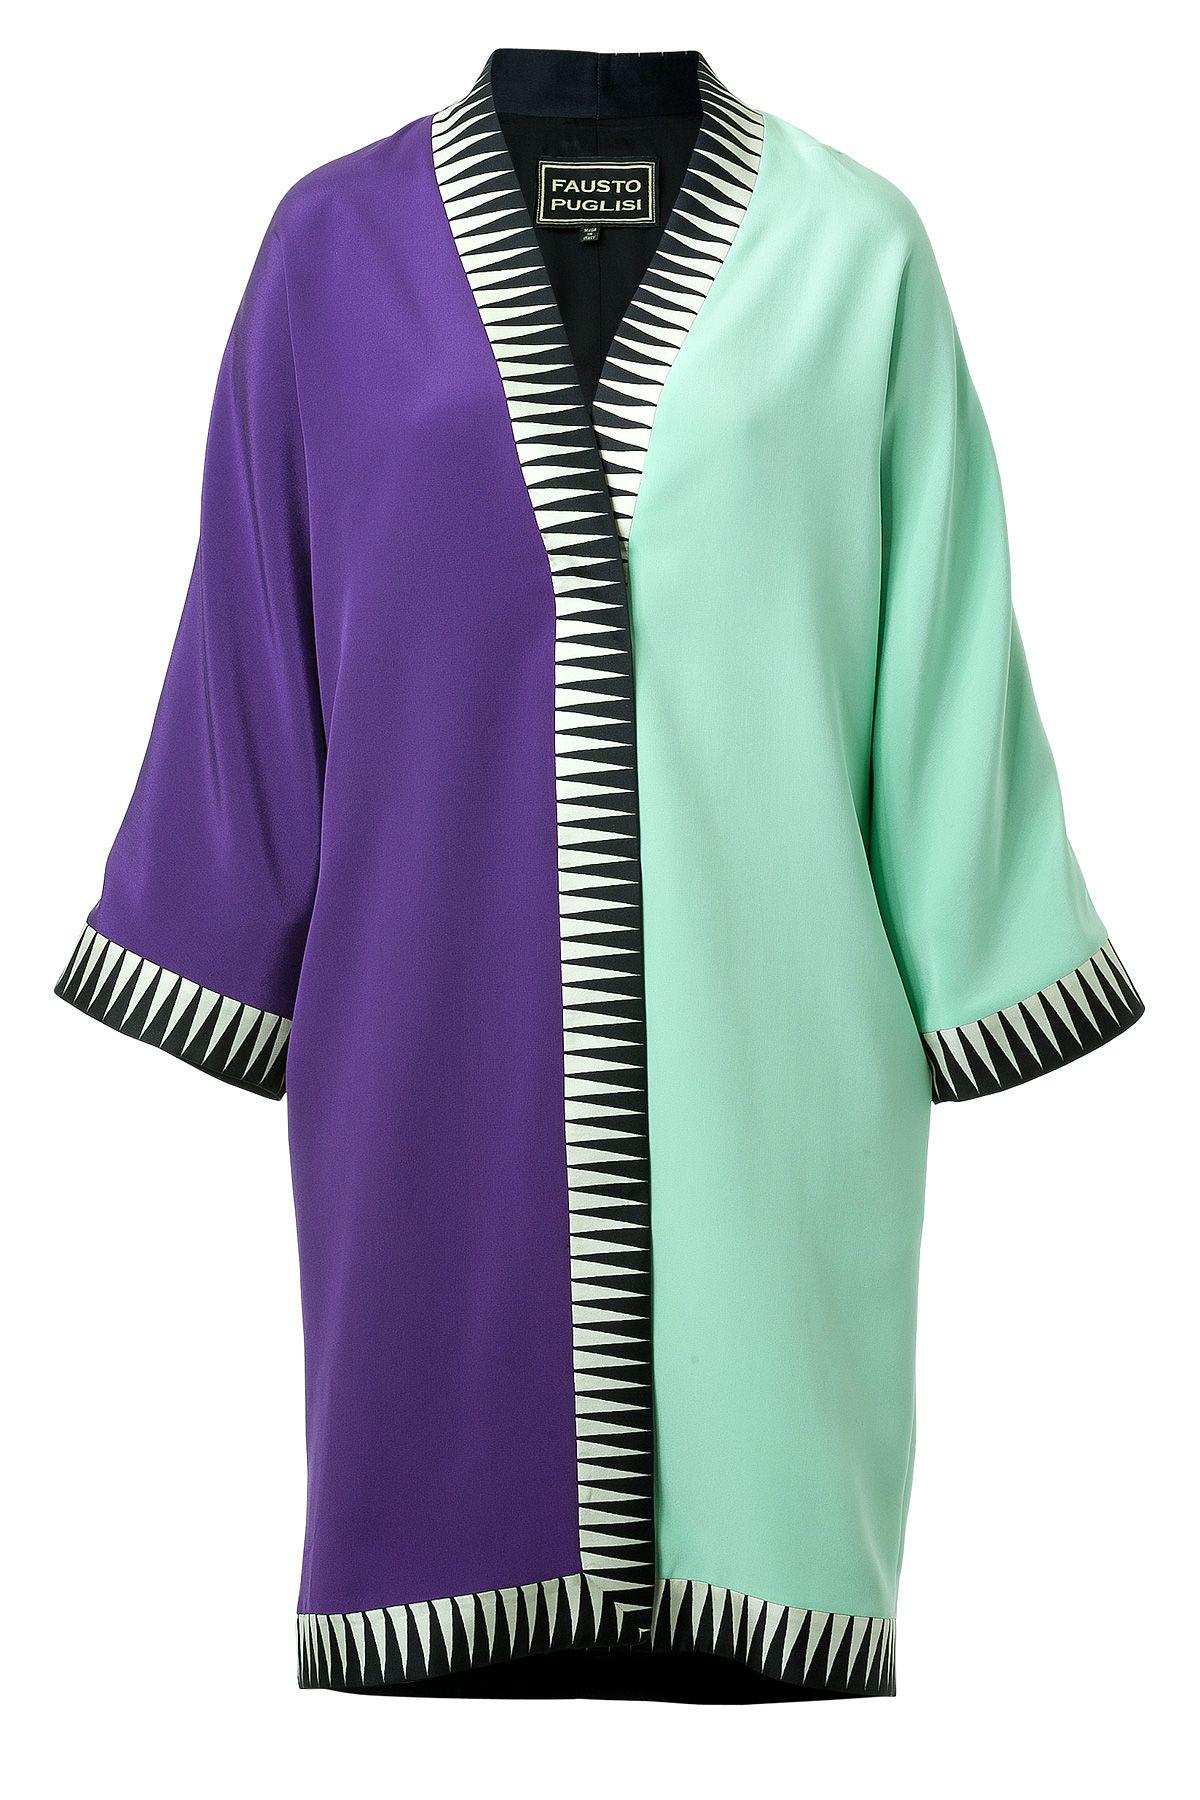 kimono coat - Google zoeken